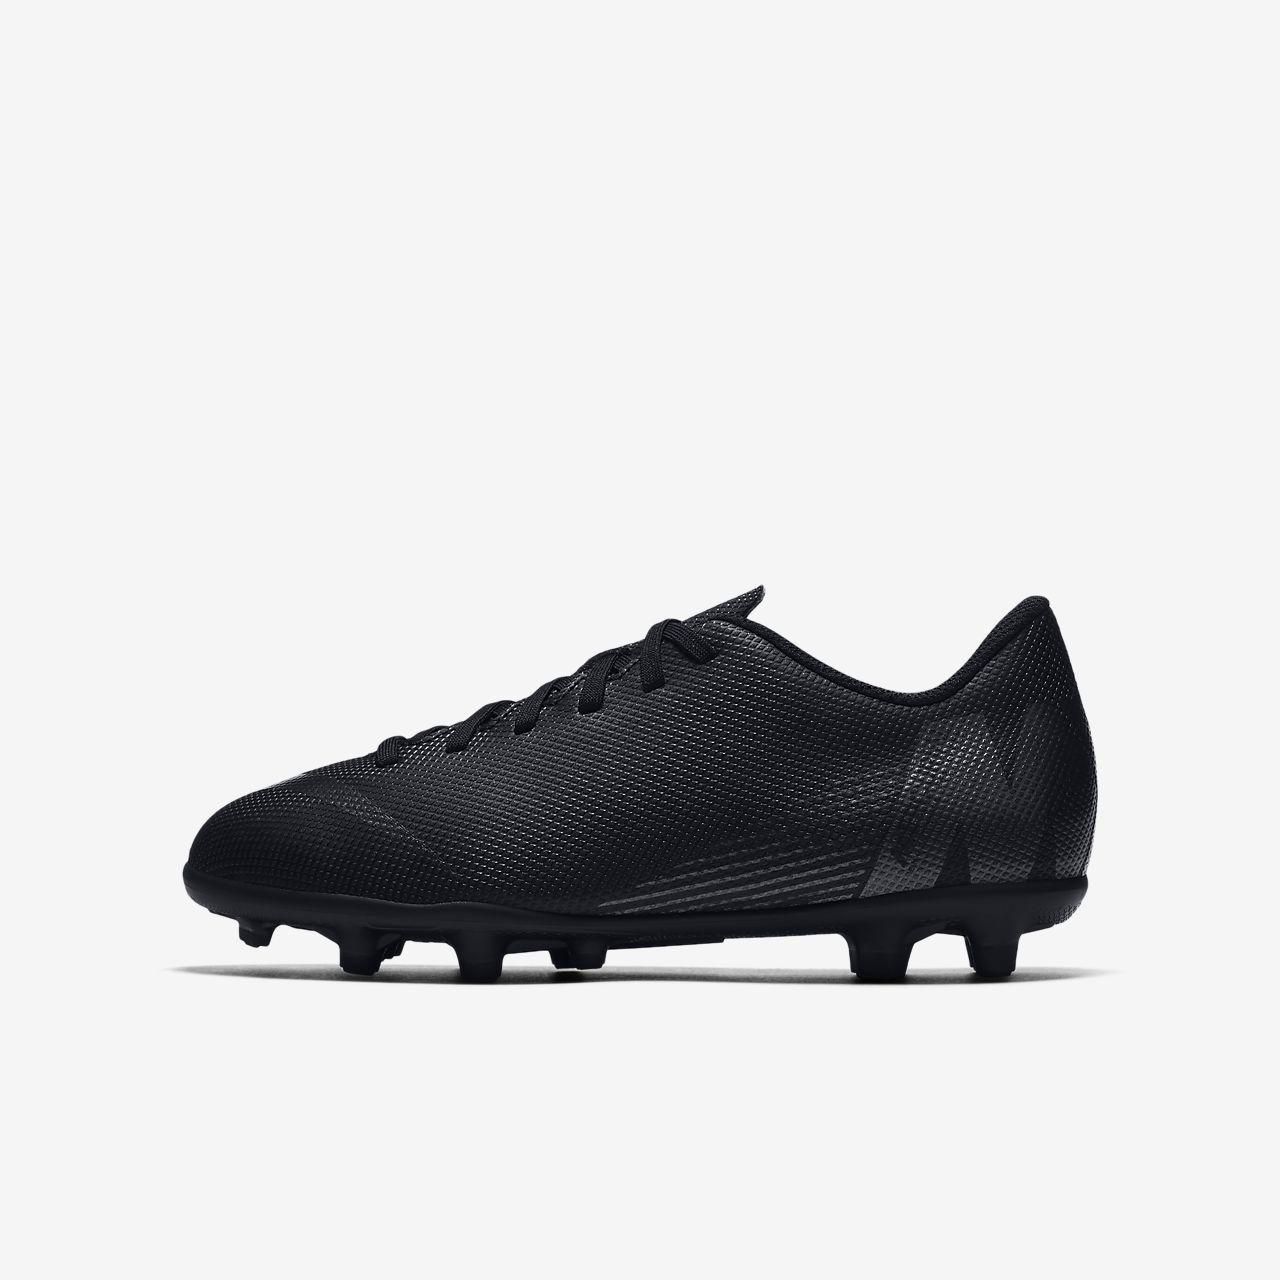 timeless design 9e8de f66e0 ... Nike Jr. Vapor 12 Club MG Fußballschuh für verschiedene Böden für  ältere Kinder